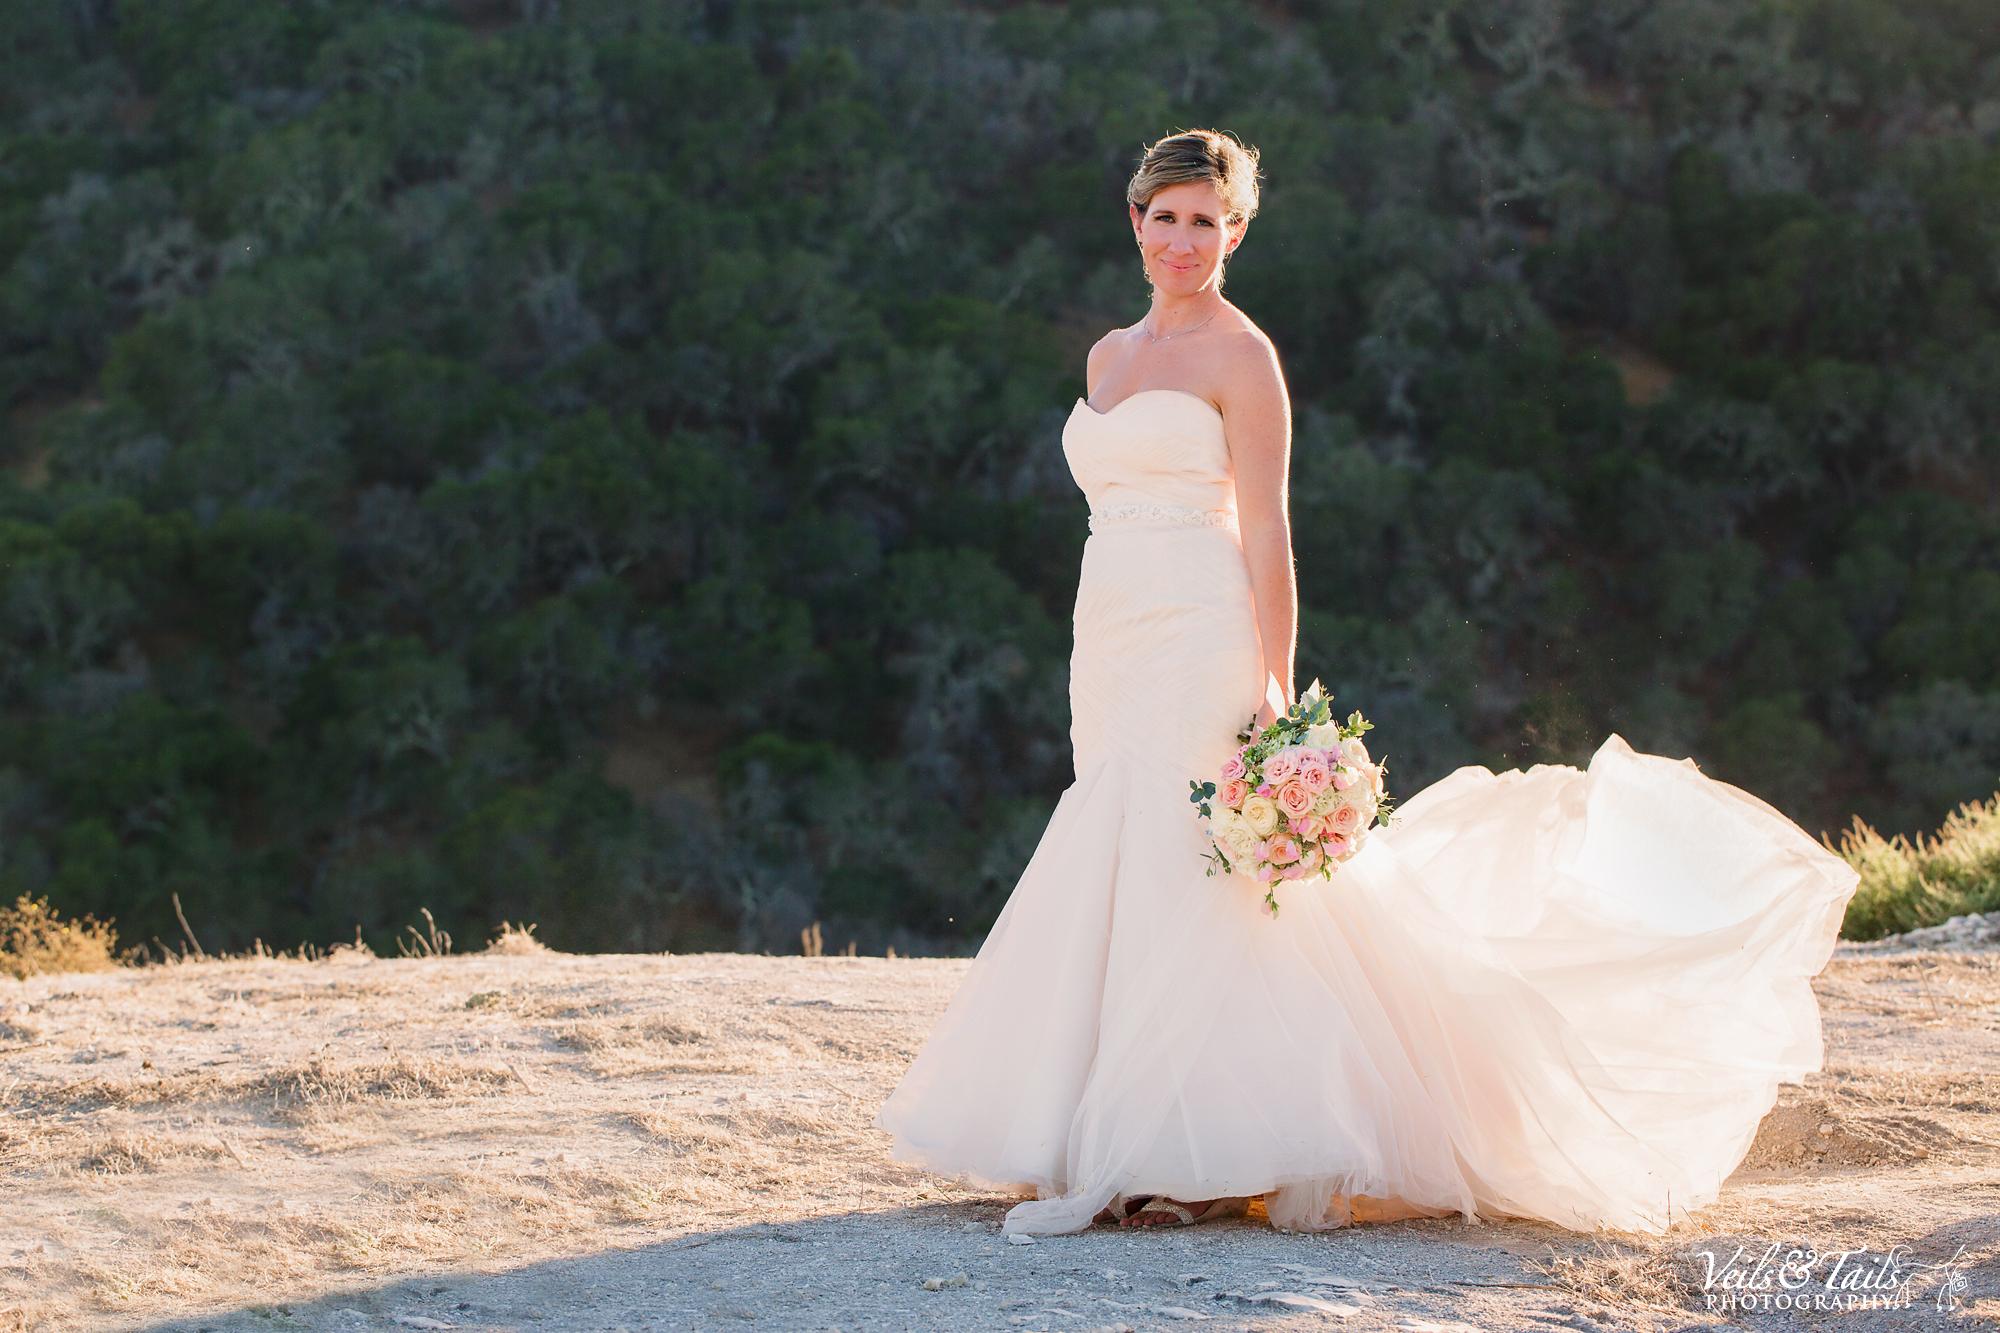 average price for wedding photographer in california